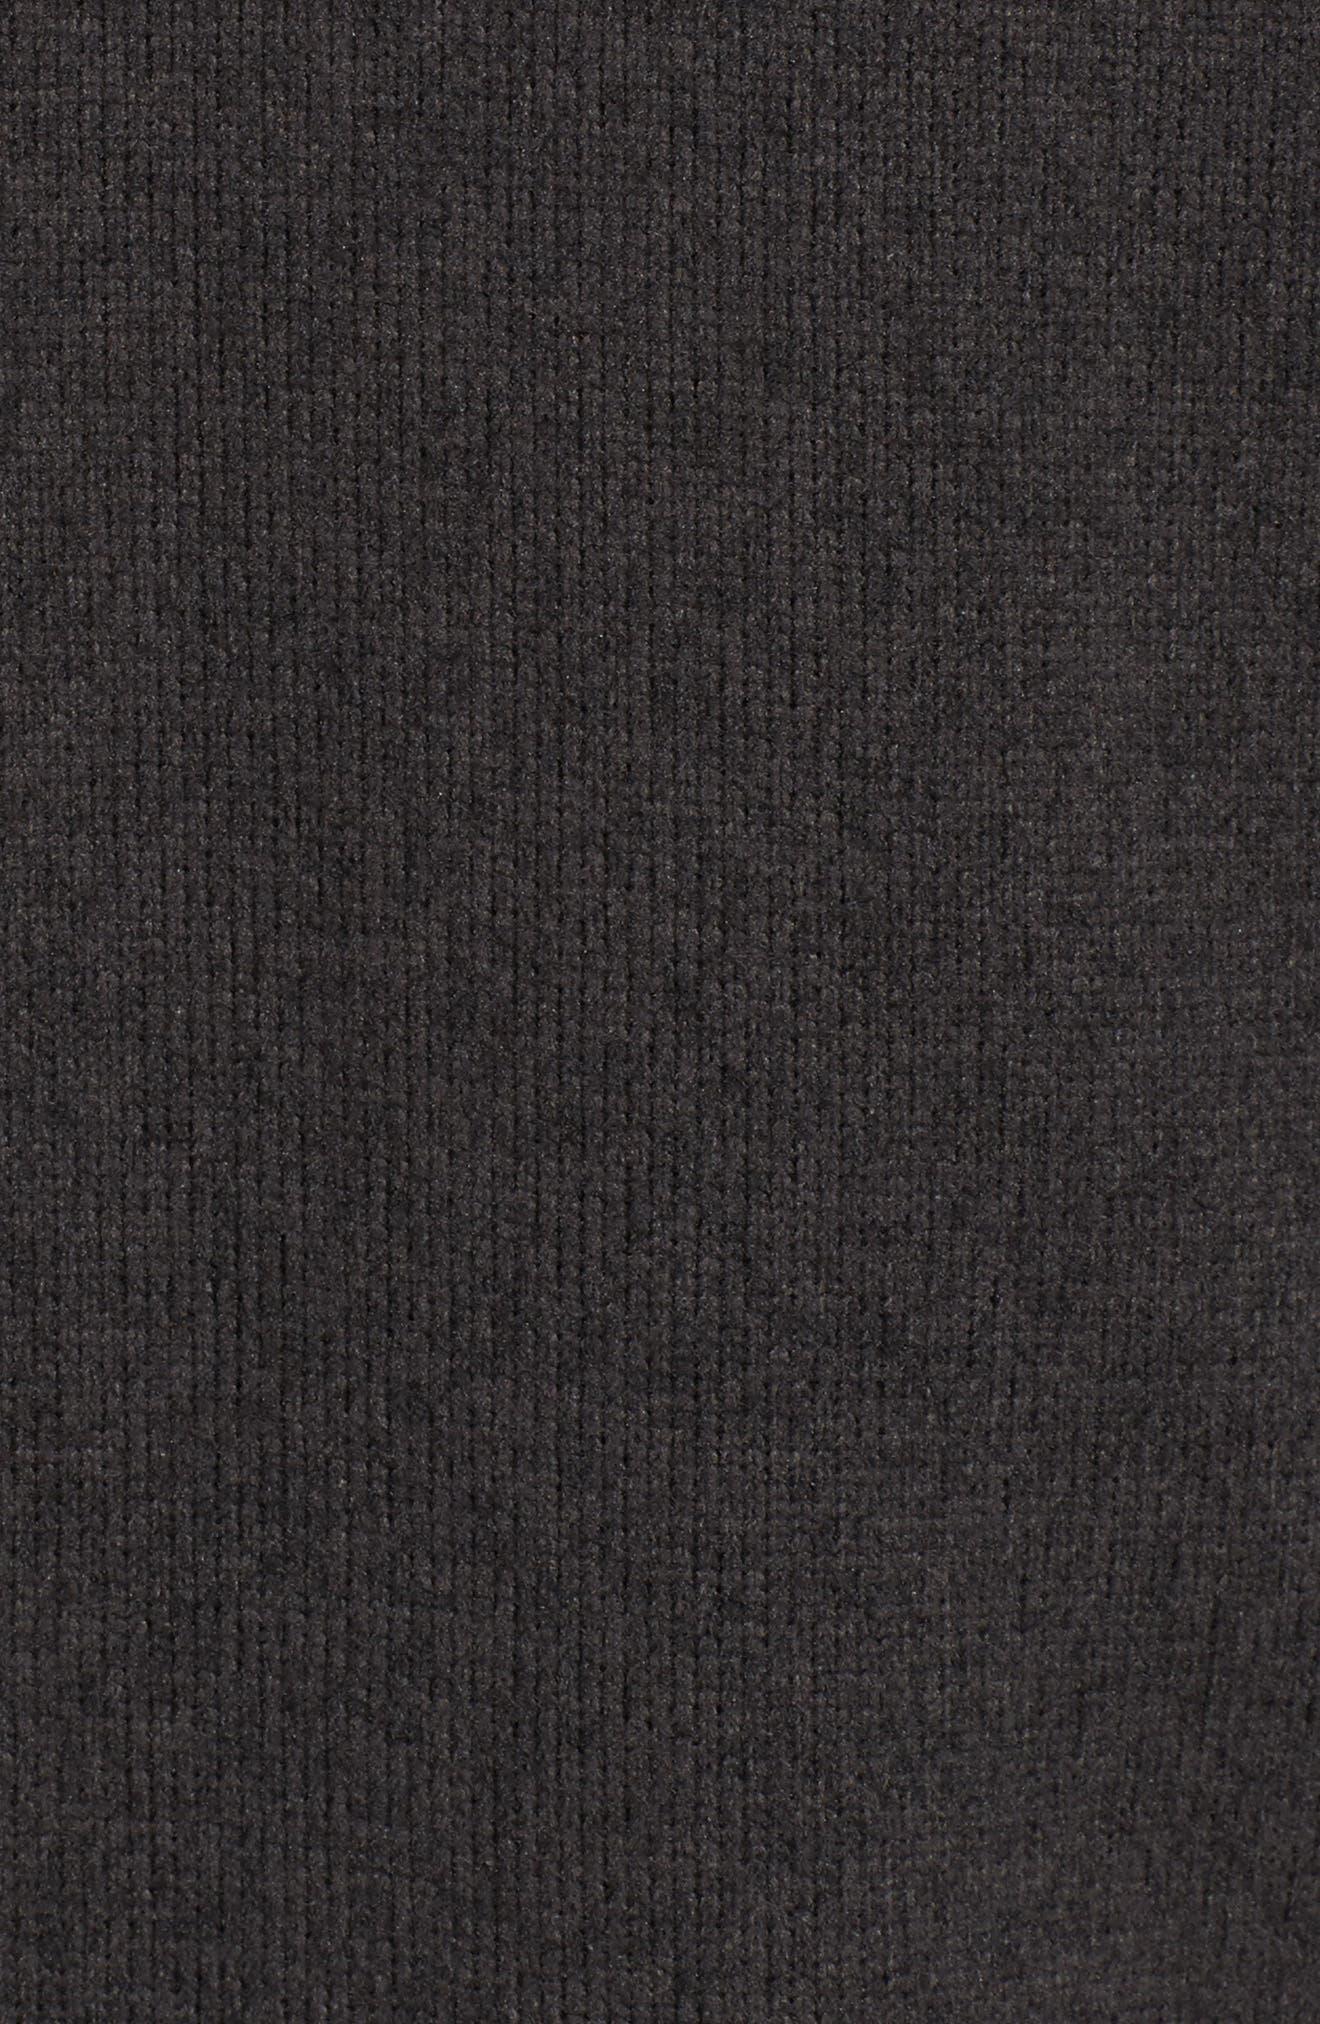 THE NORTH FACE, 'Gordon Lyons' Zip Fleece Jacket, Alternate thumbnail 5, color, 001